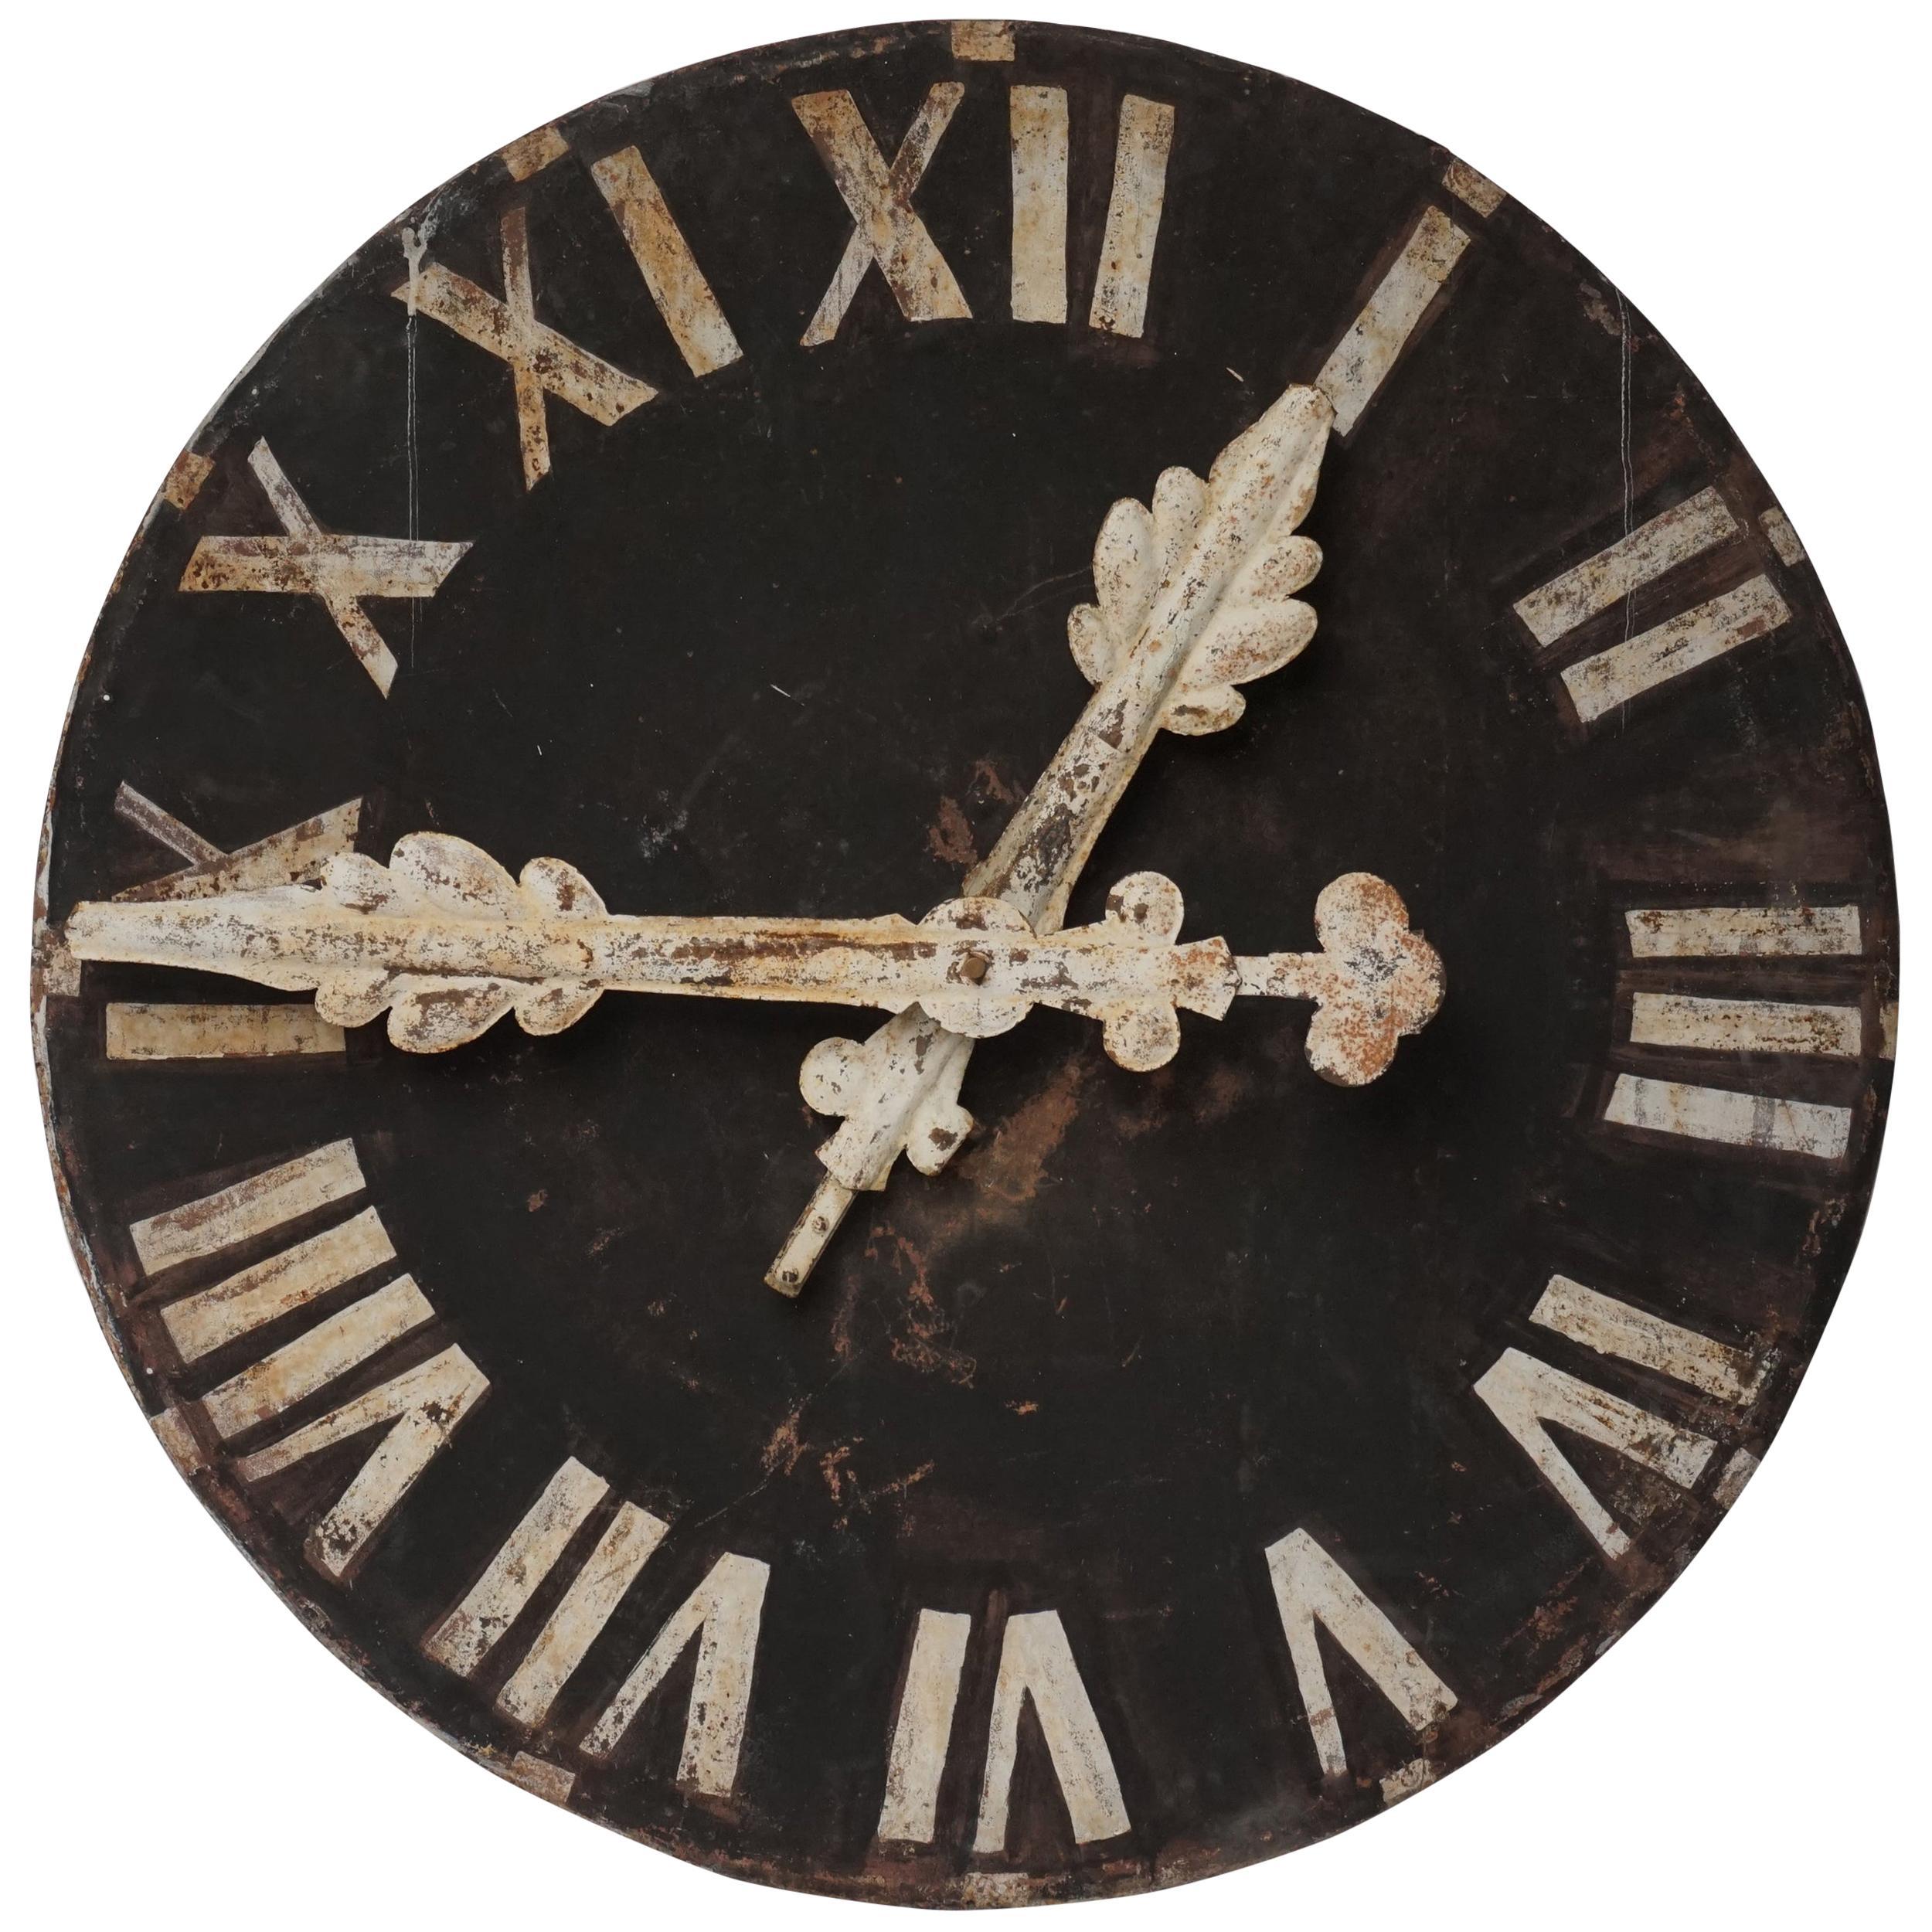 19th Century Large Austrian Metal Industrial Roman Numerals Church Clock Face